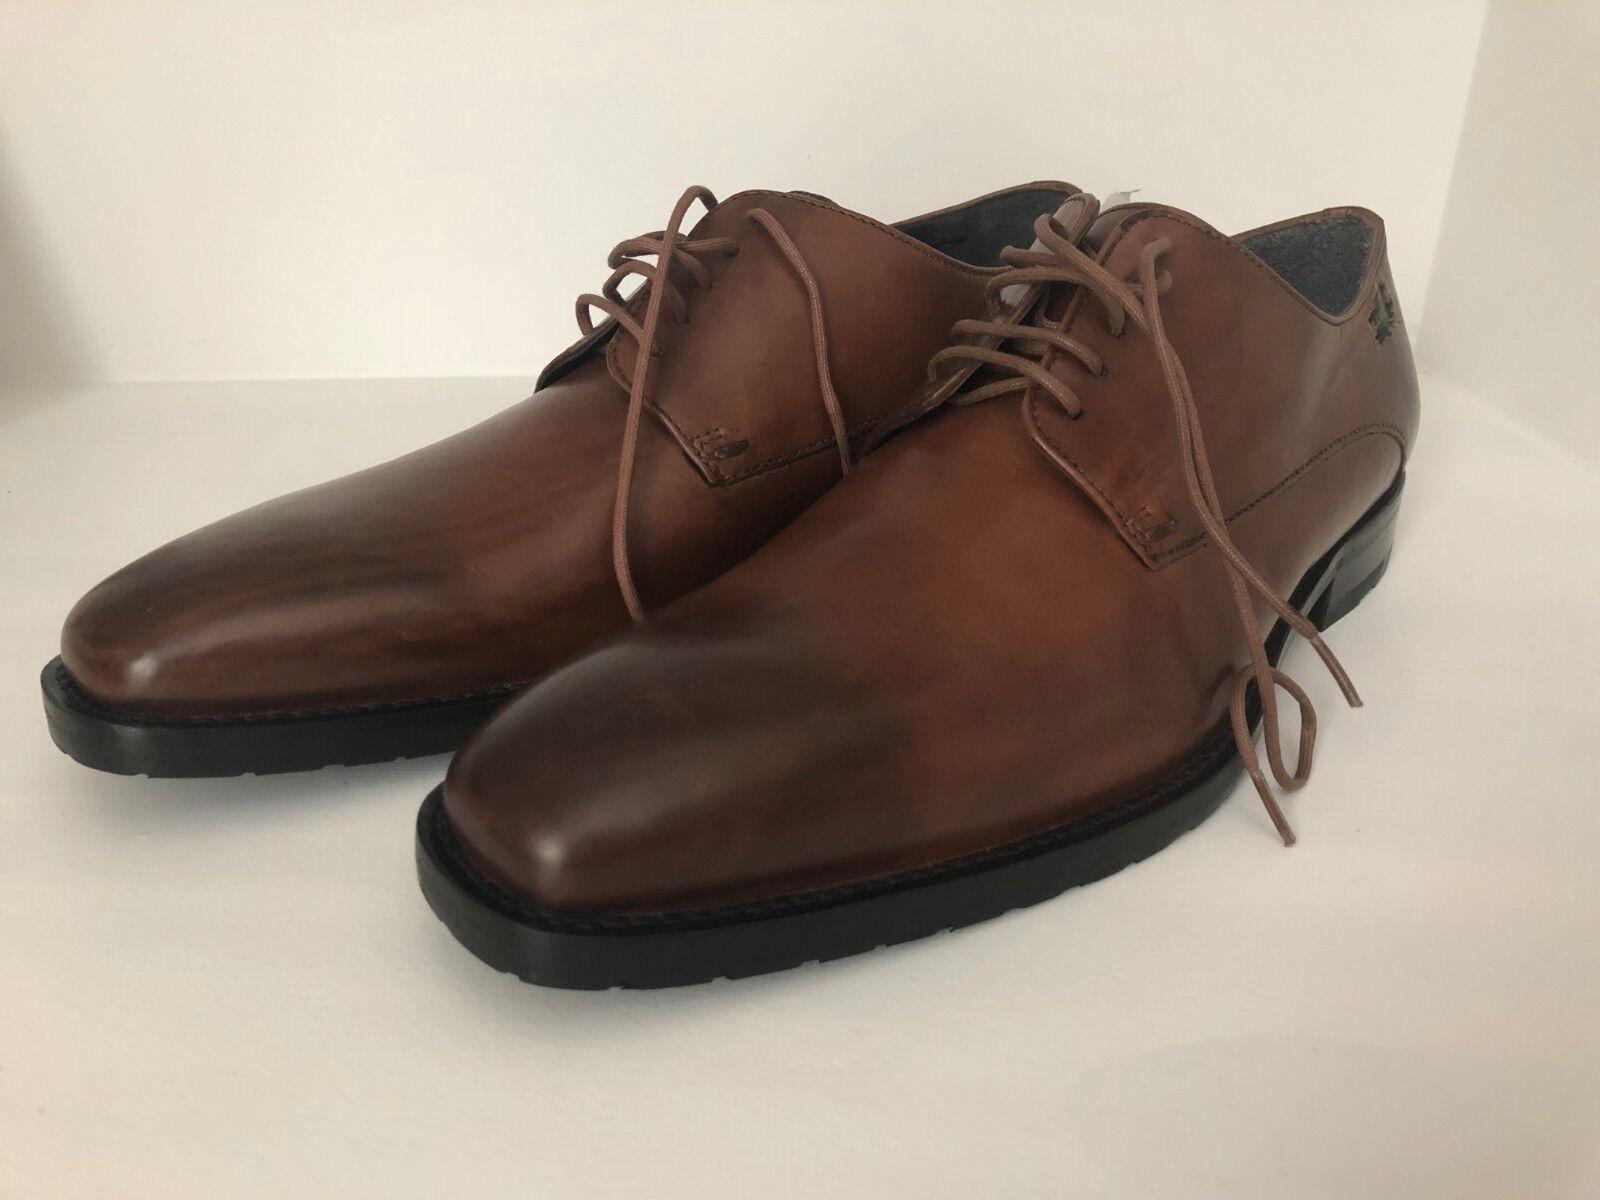 LUGANO Men's Brown Leather Oxford shoes (US 9.5 Medium)